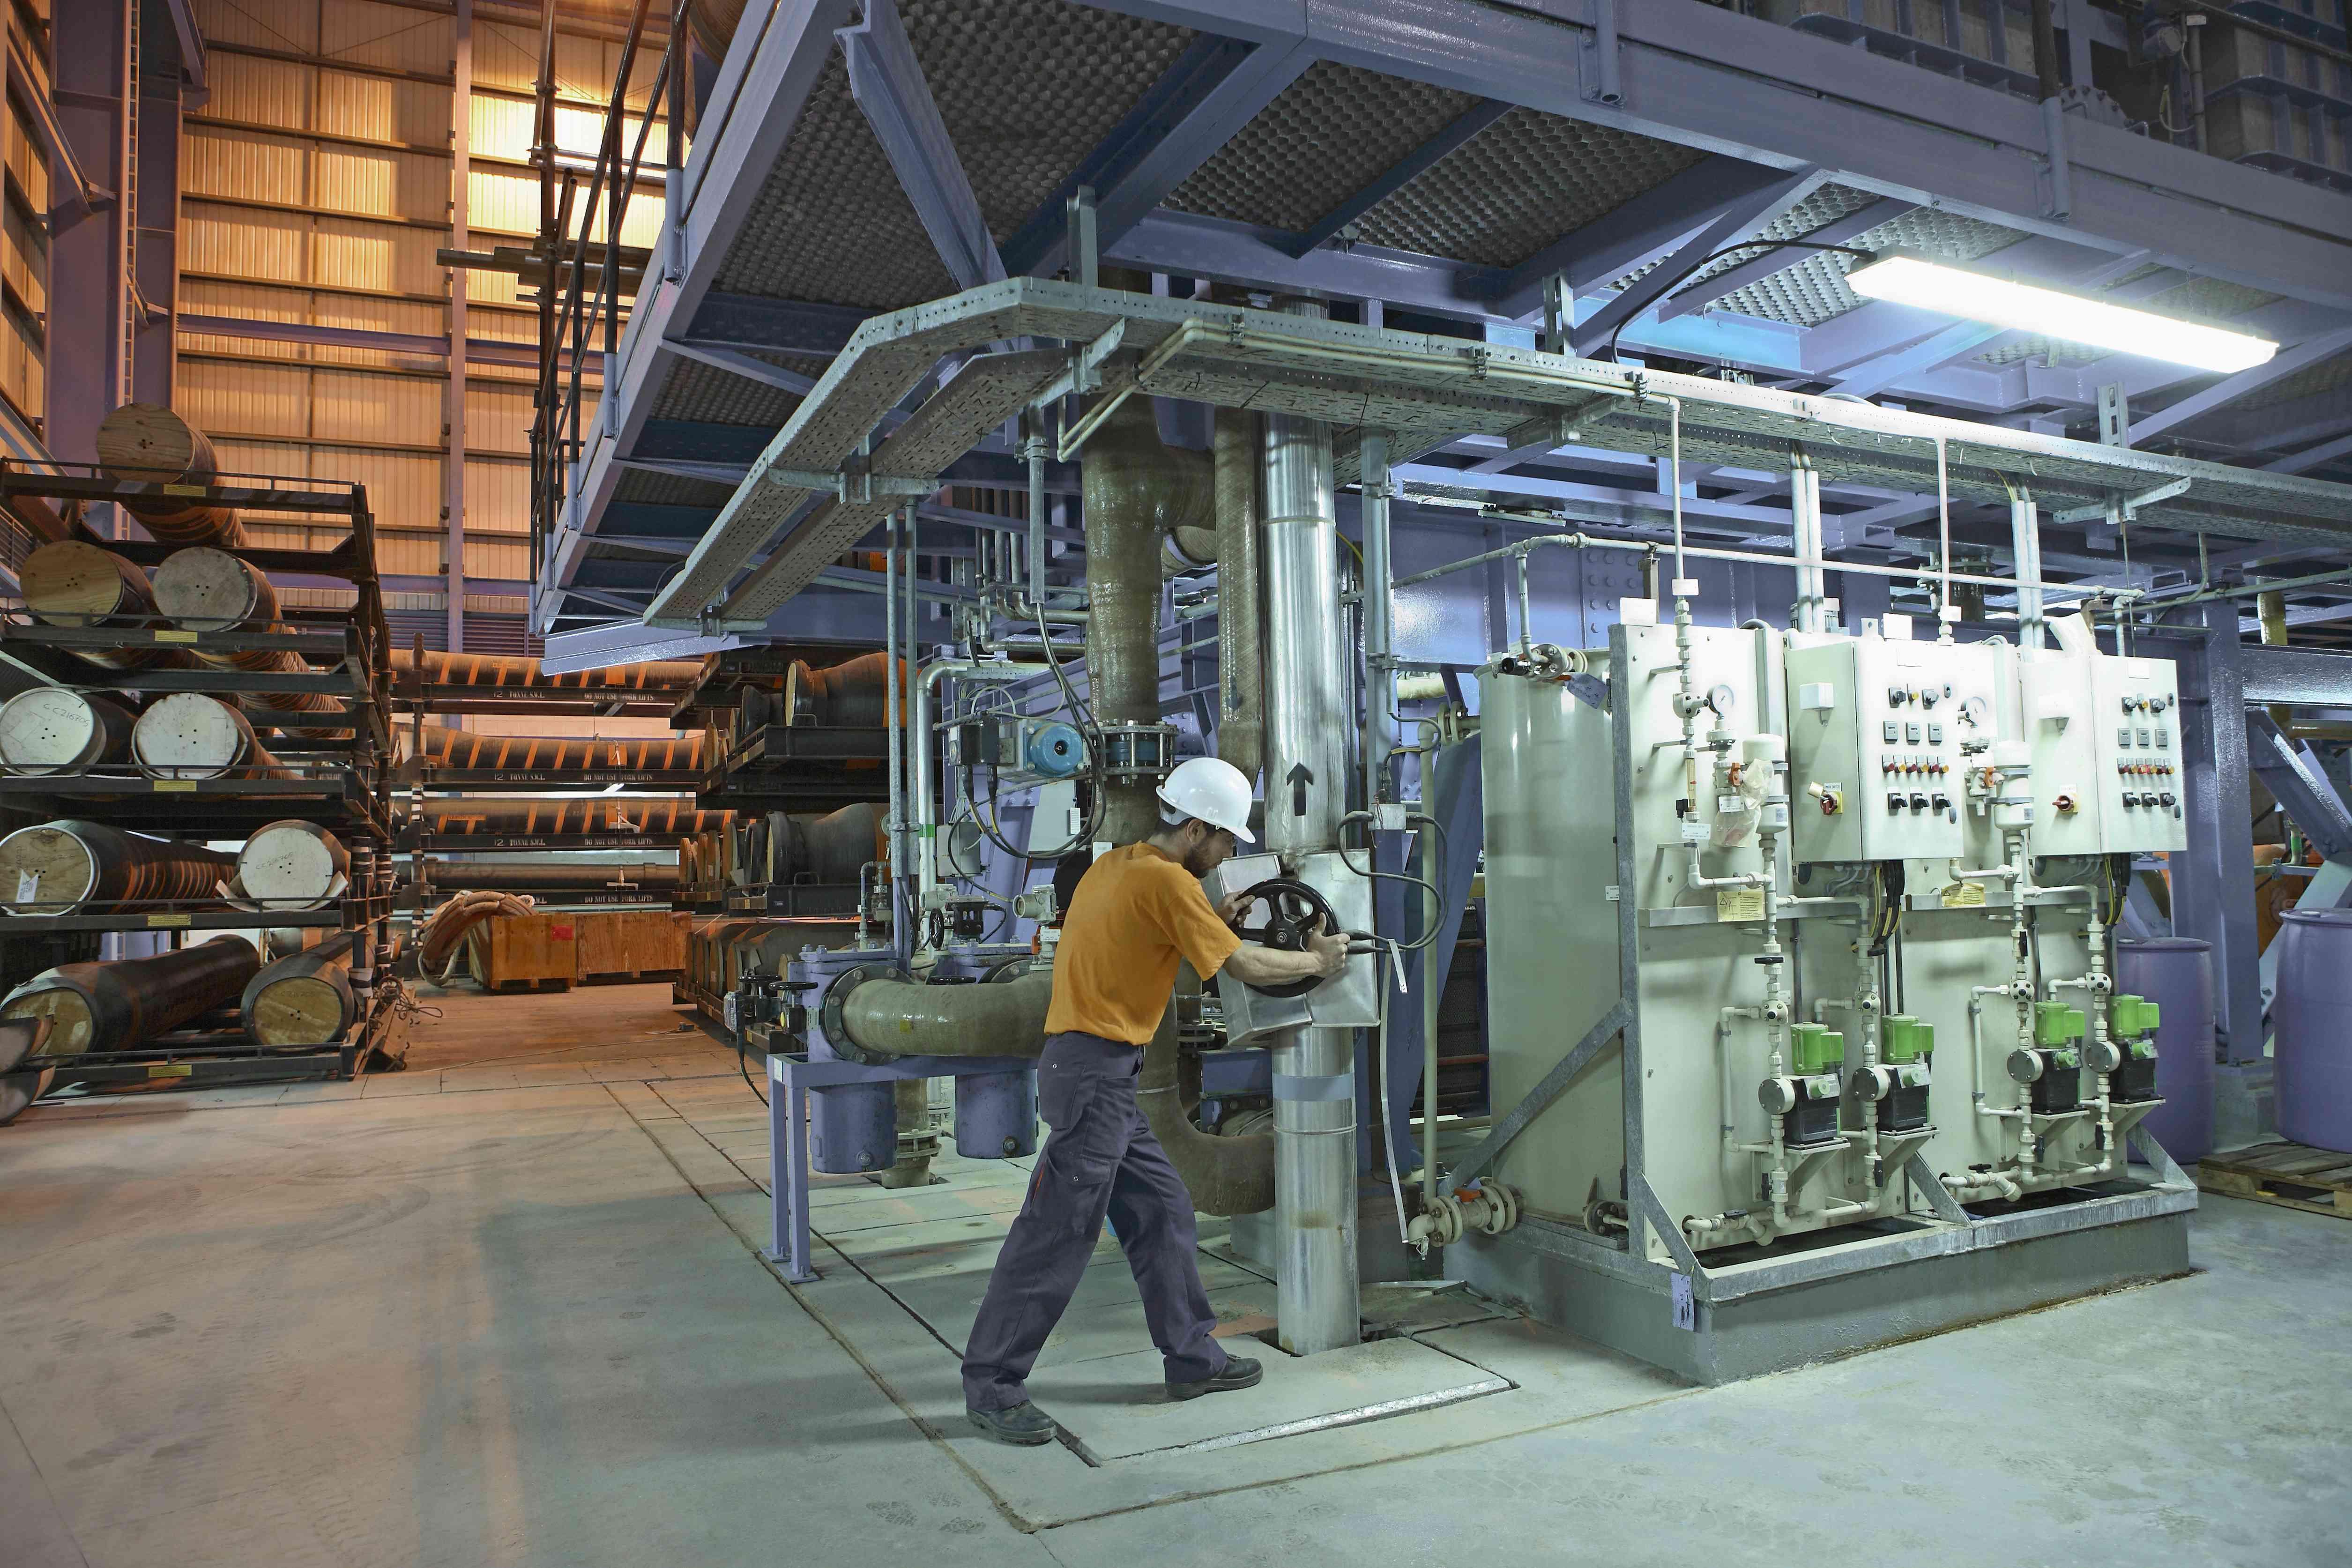 Technician closing valve desalination plant in power station